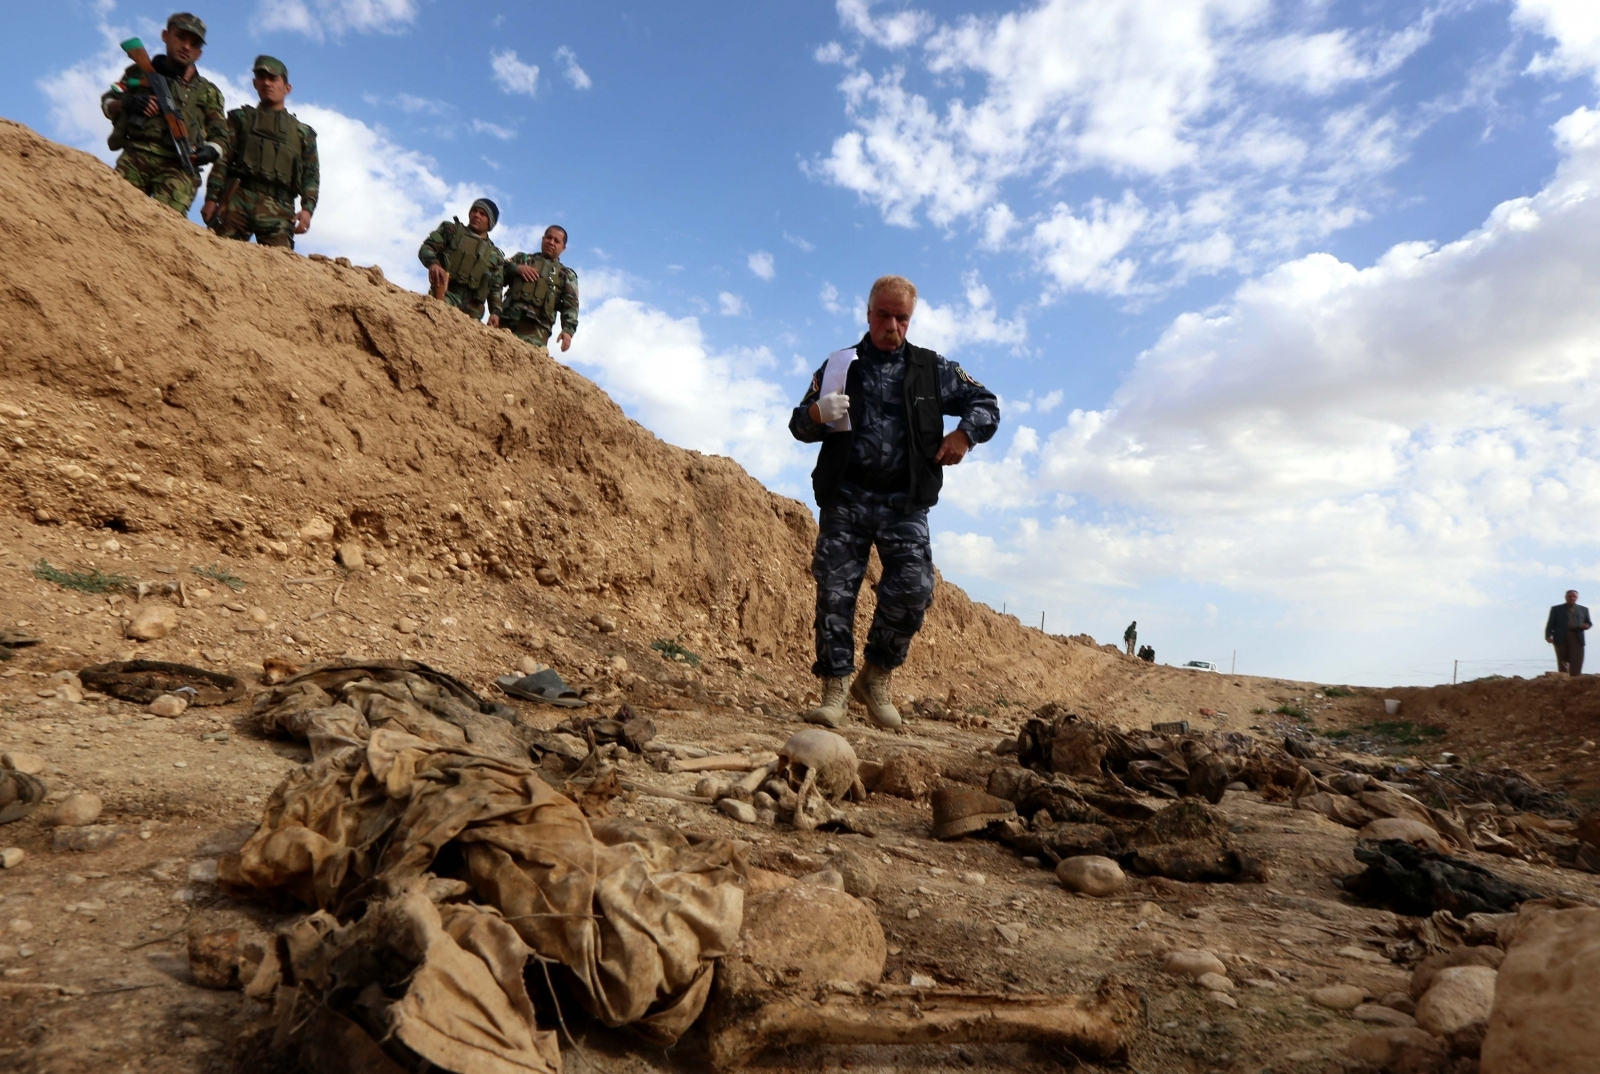 Kurdish forces look at the remains of Yazidis killed by the Isis jihadist group